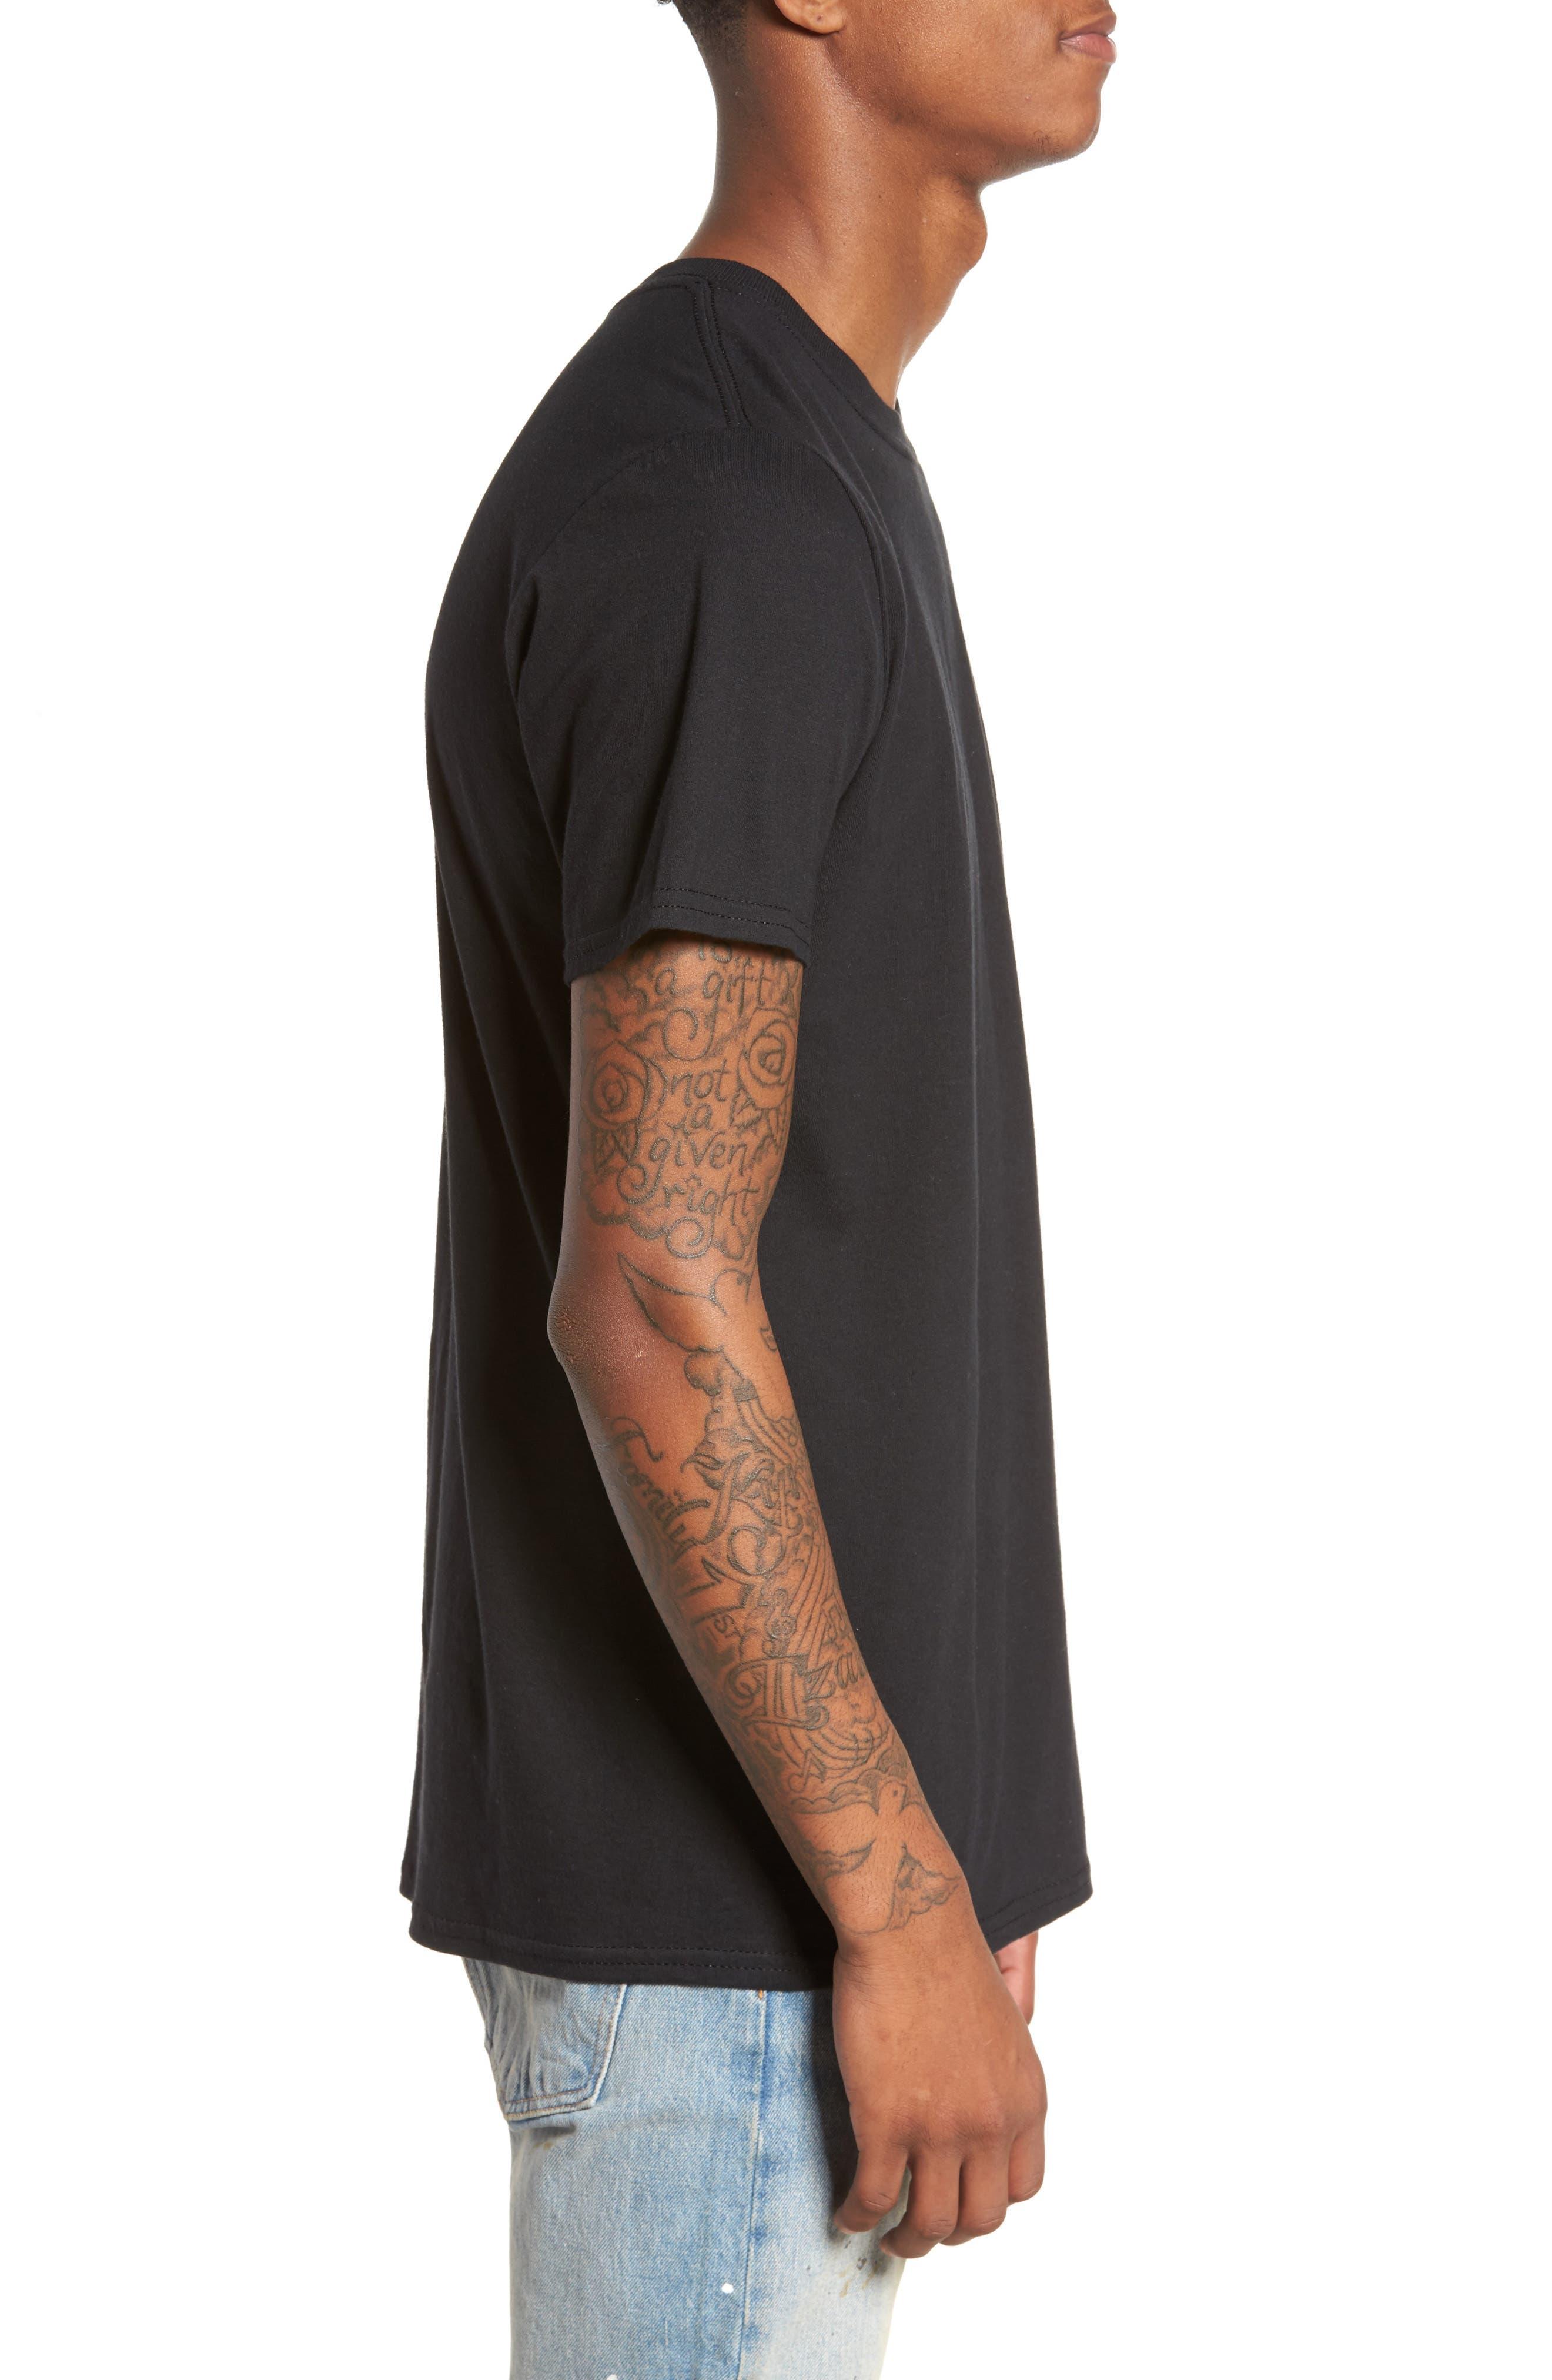 Tis The Season Embroidered T-Shirt,                             Alternate thumbnail 3, color,                             Black Tis The Season